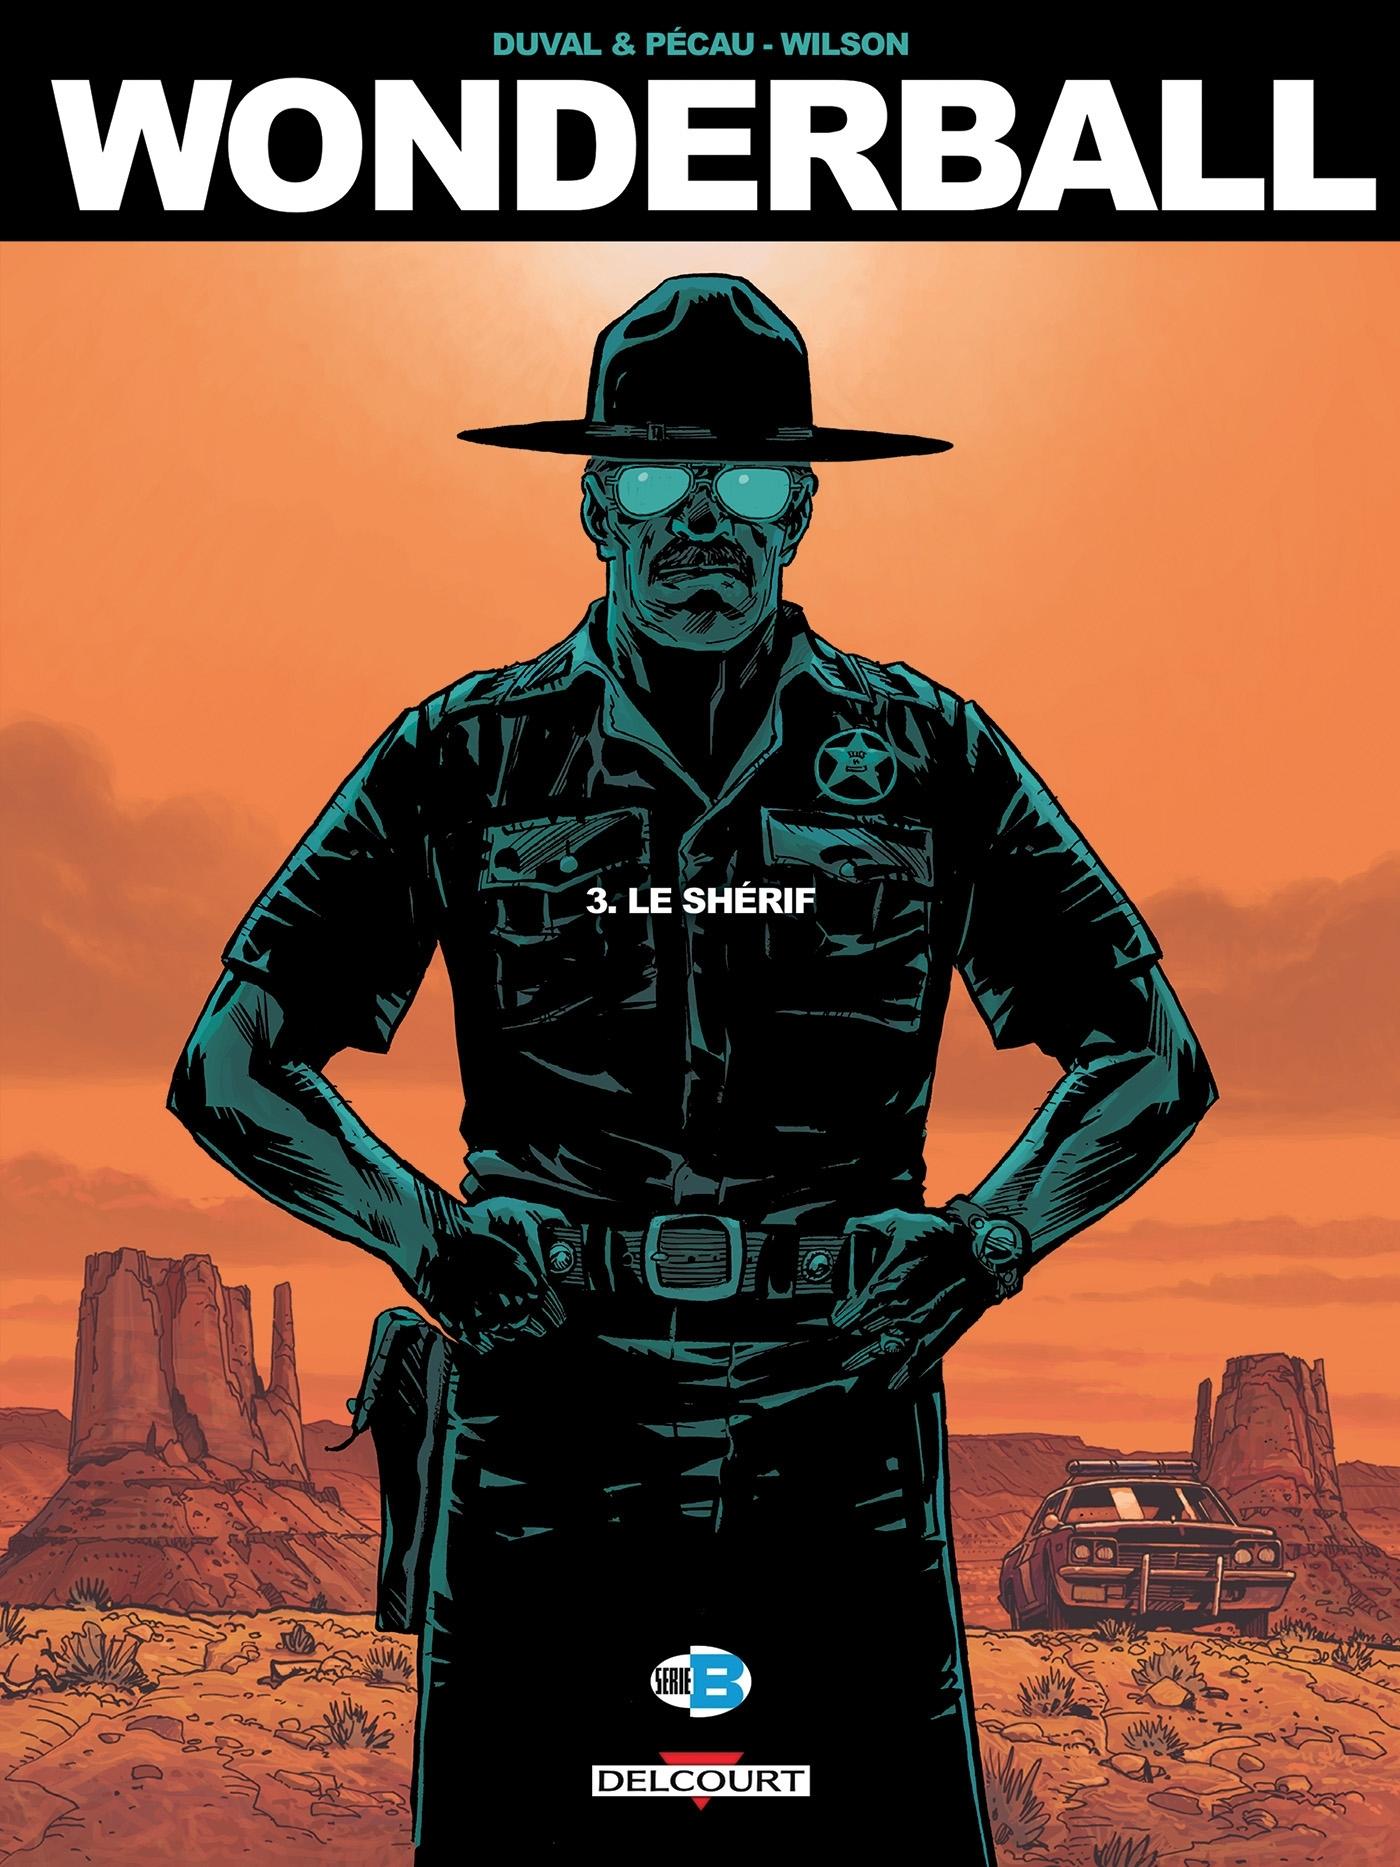 WONDERBALL T3 - LE SHERIF